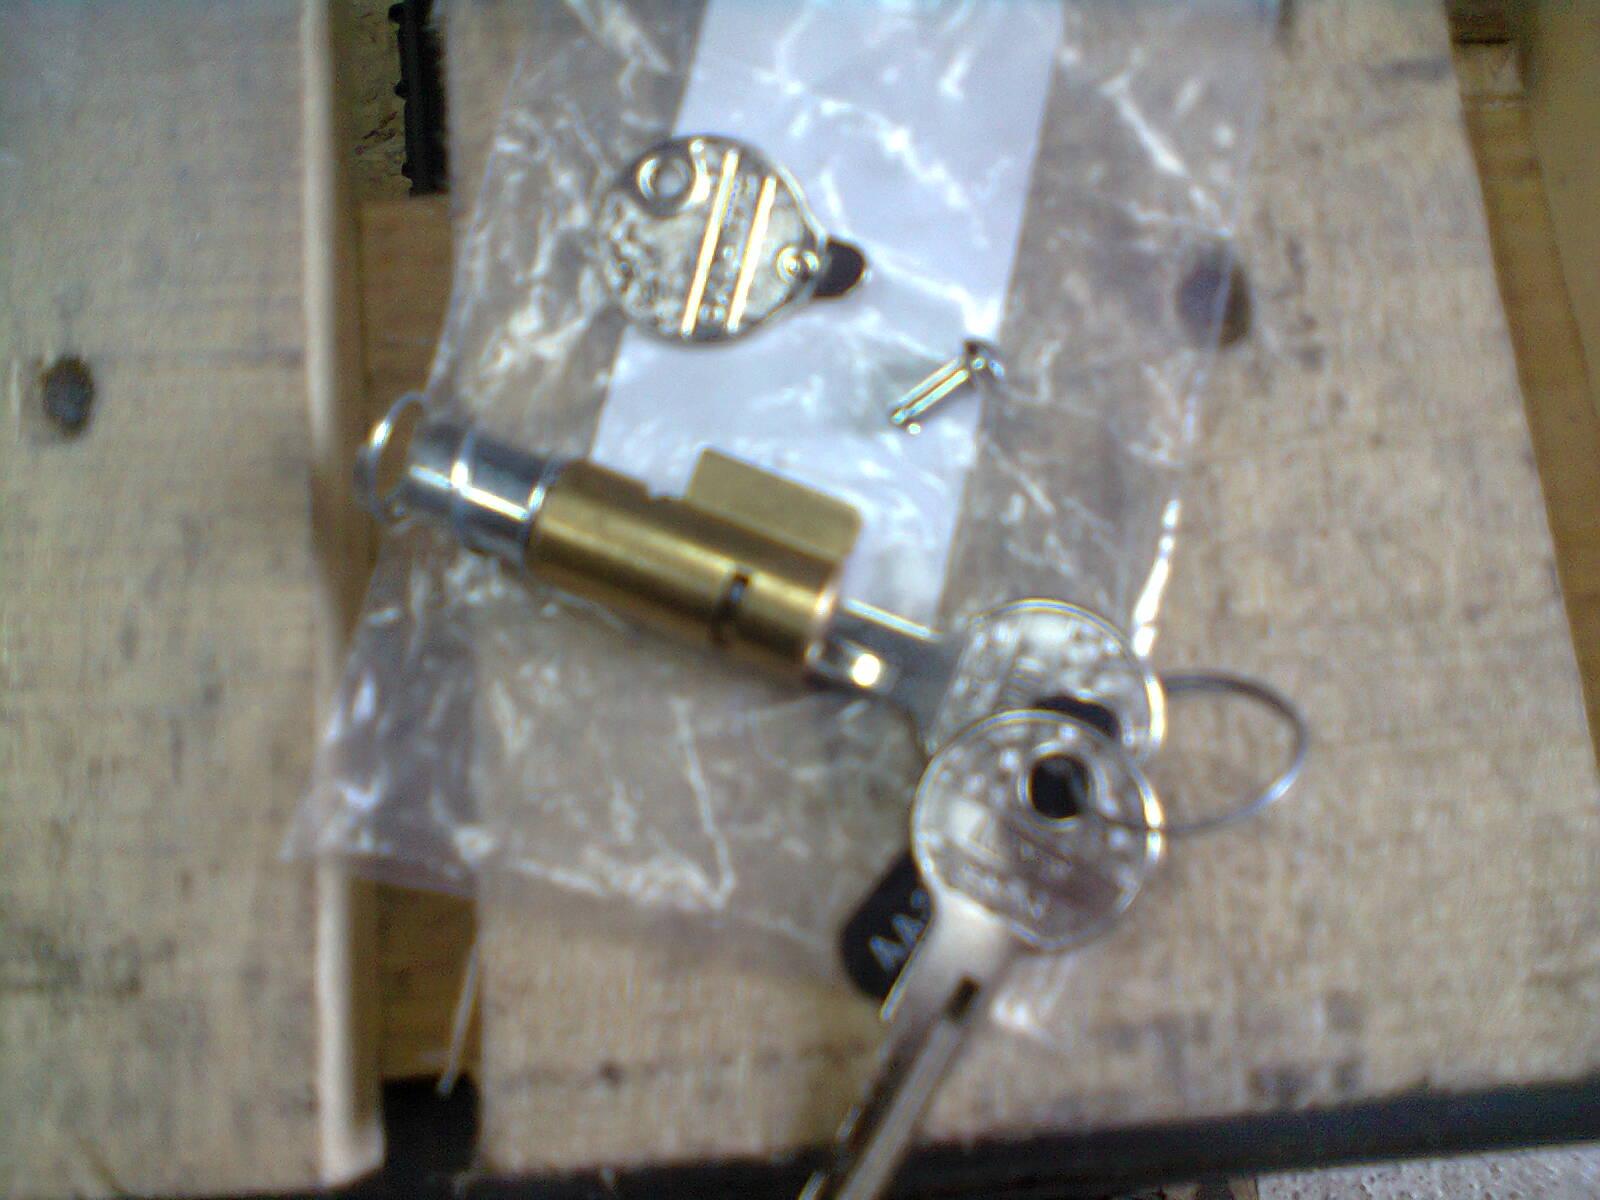 Installing Neimann steering lock on GL1100